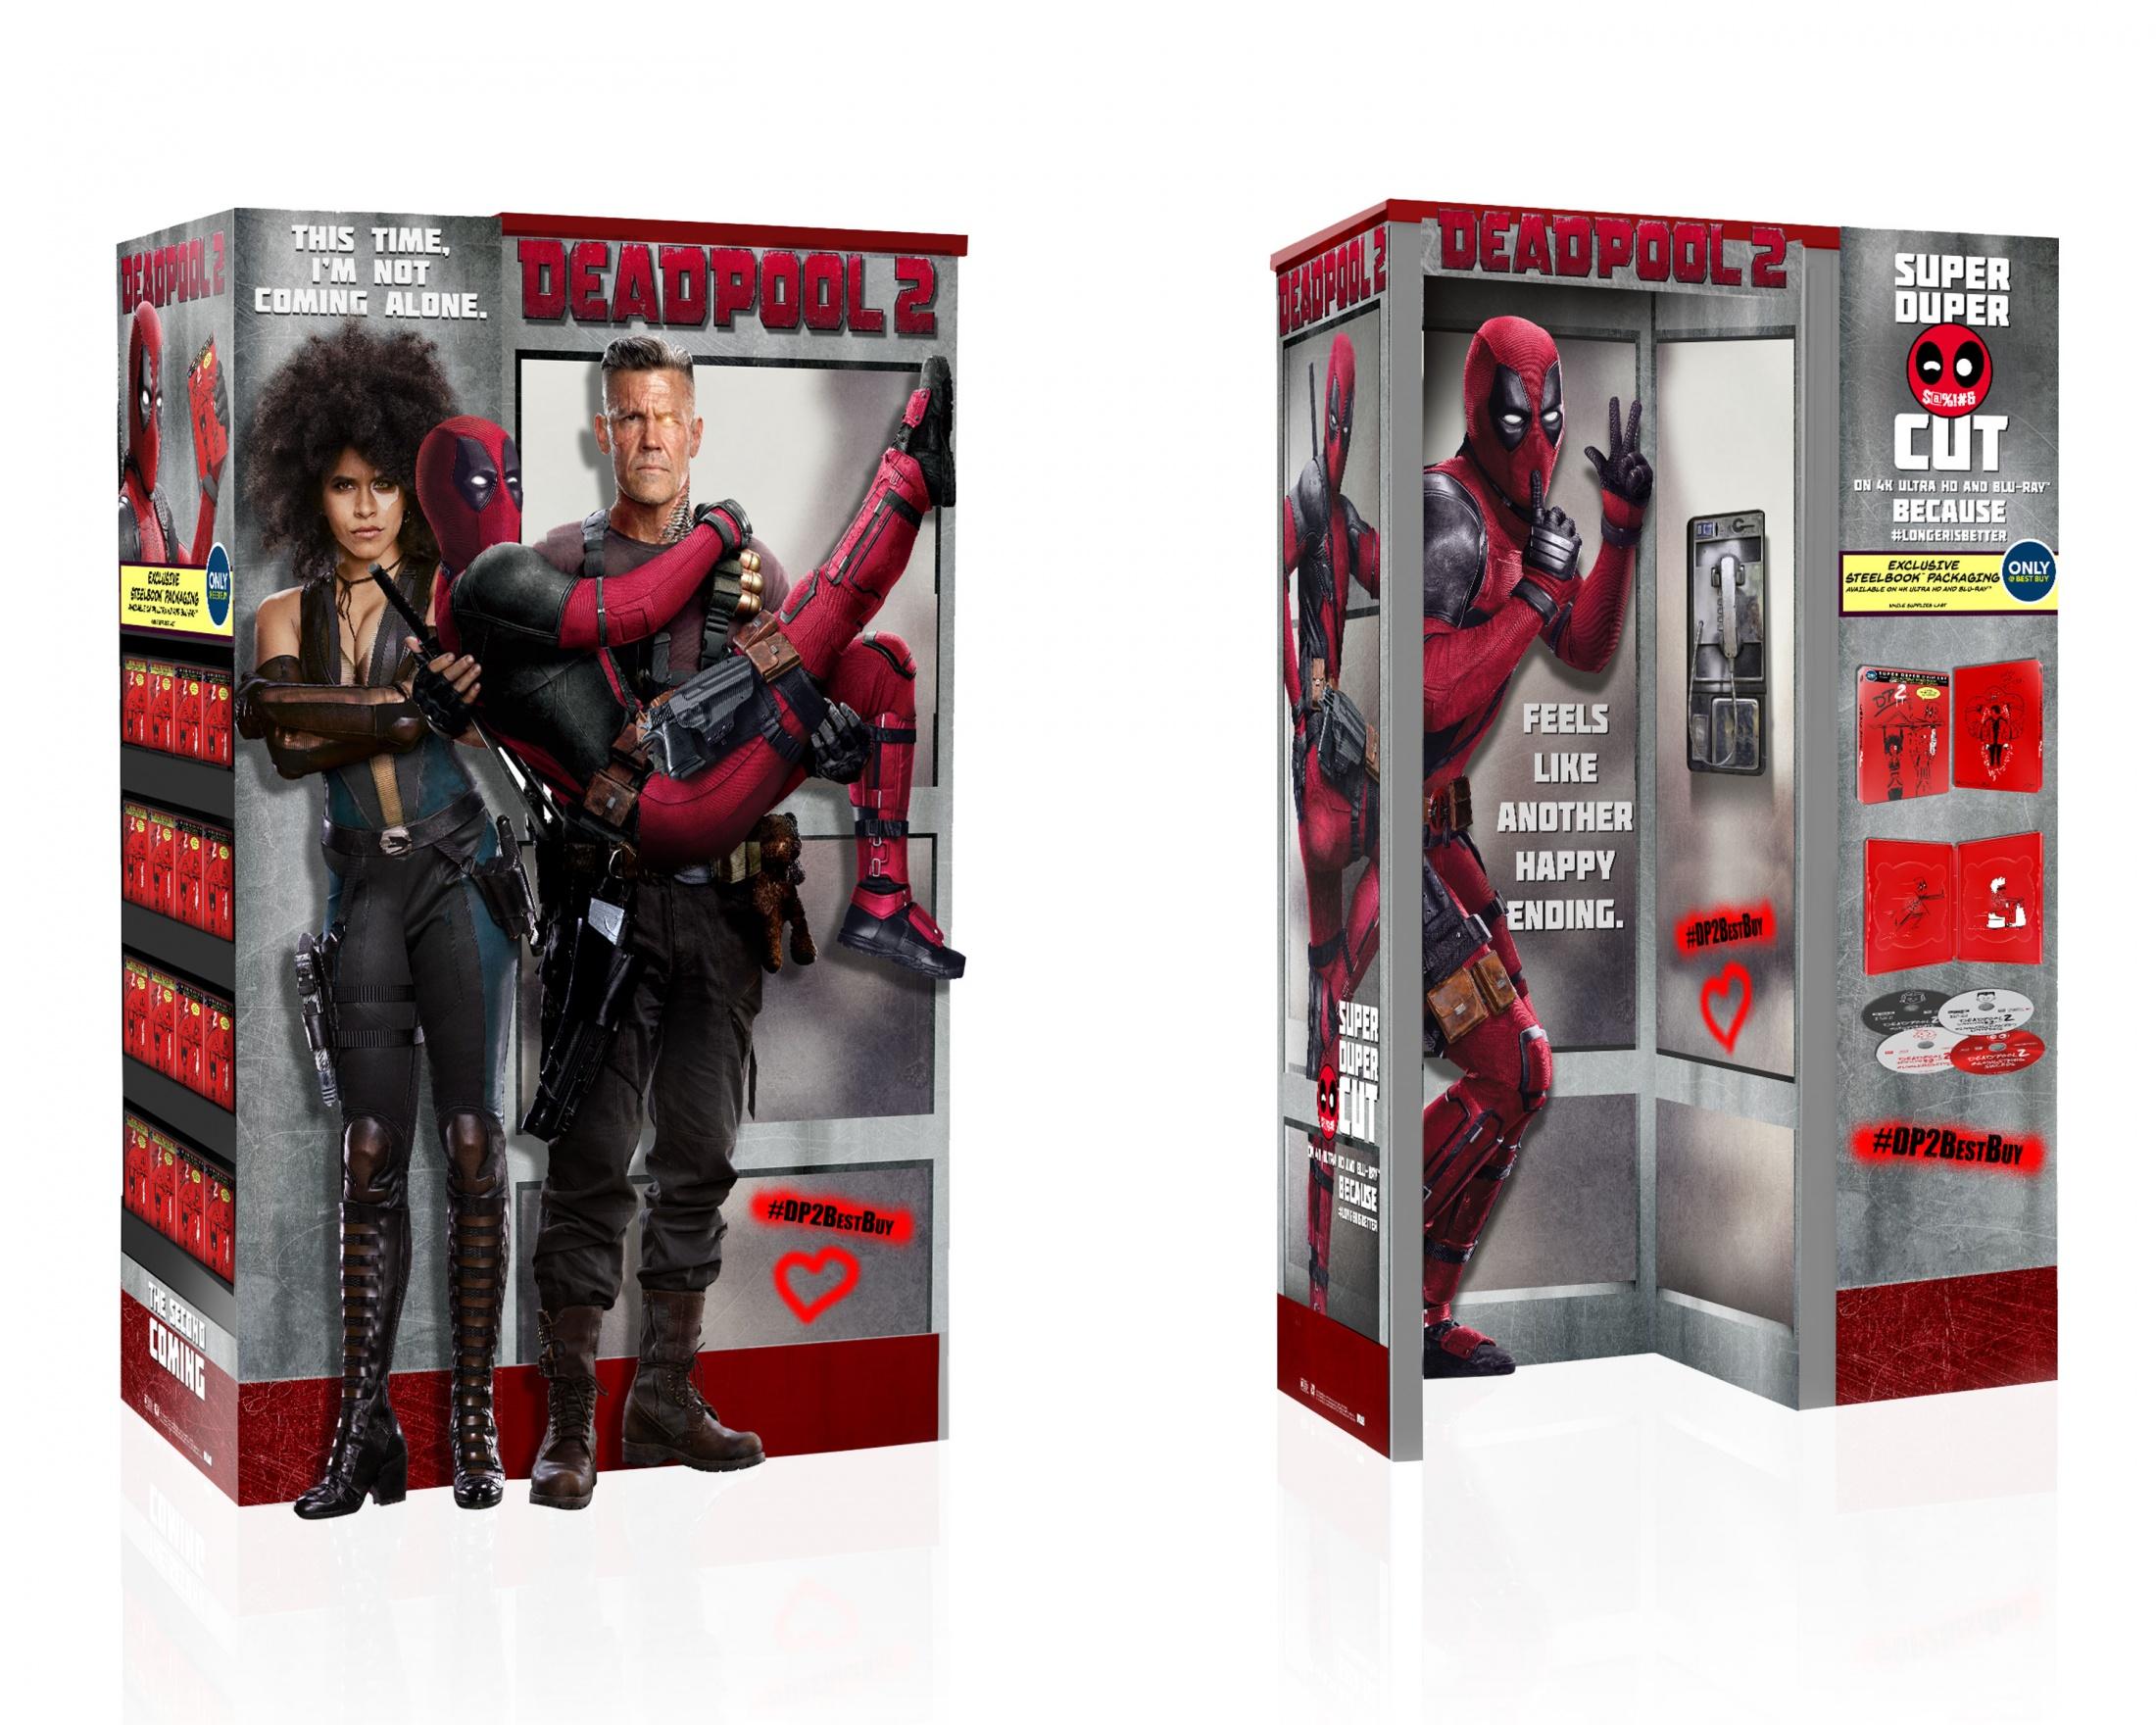 Thumbnail for Deadpool 2 BBY WOW Phone Booth